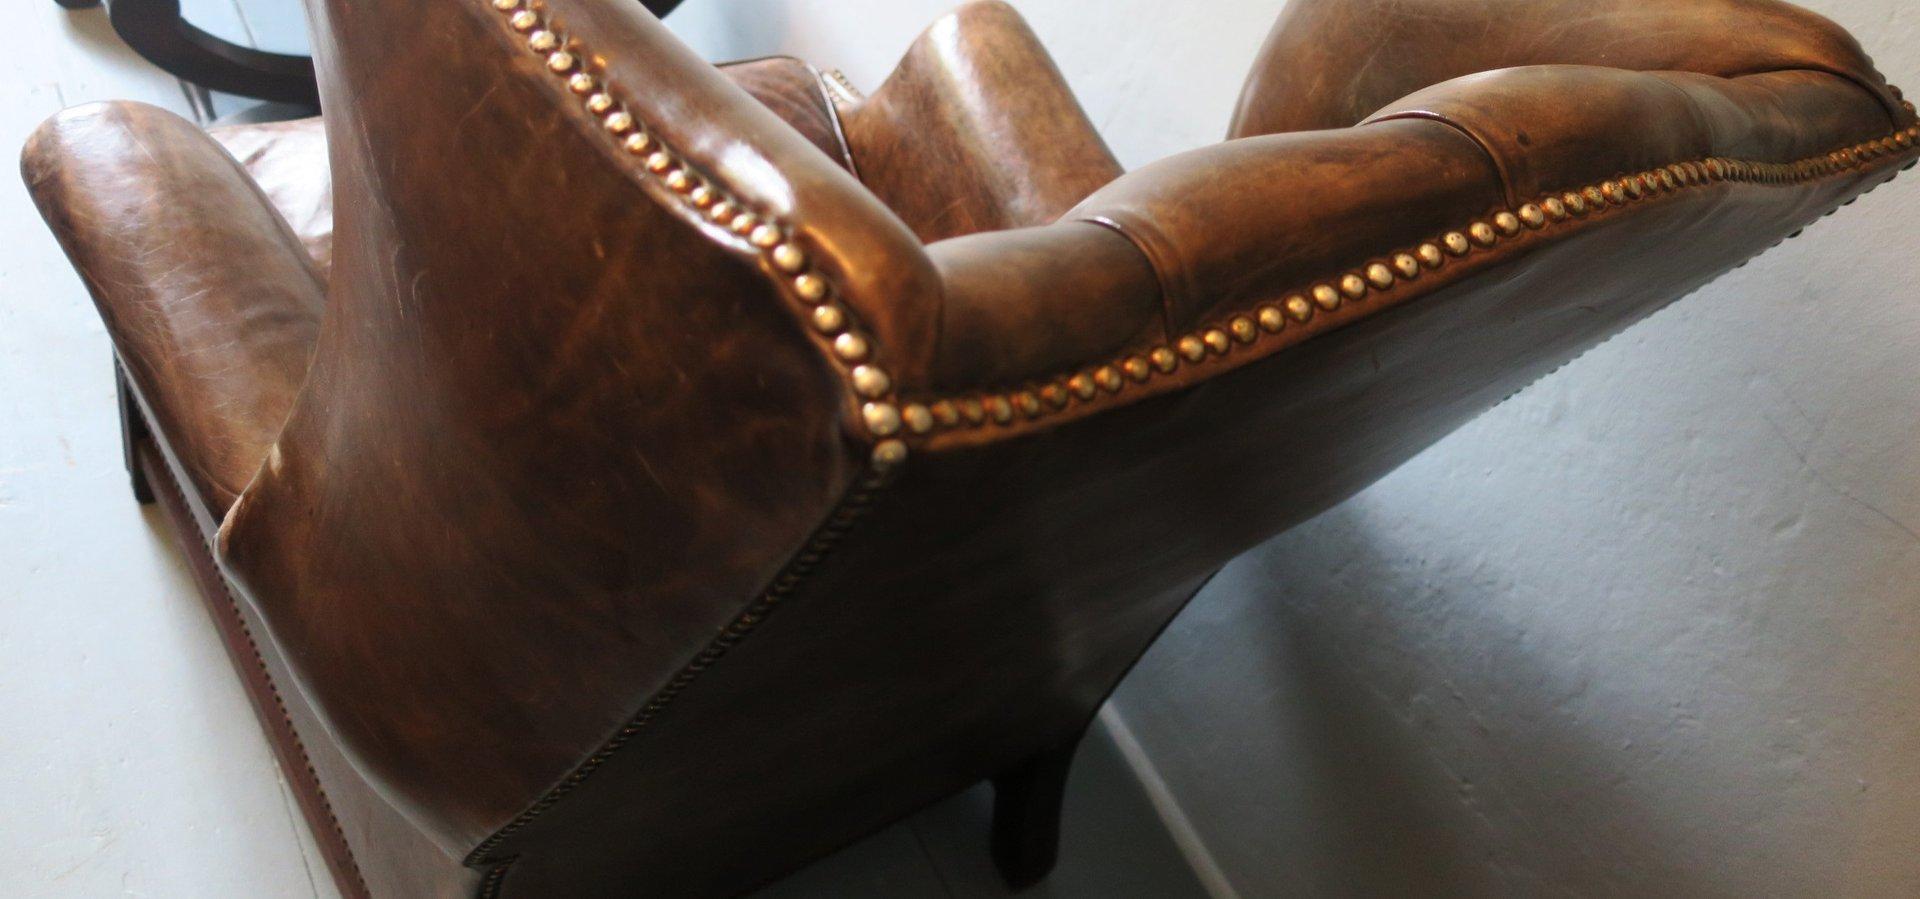 dunkelbrauner vintage leder chesterfield ohrensessel 1980er bei pamono kaufen. Black Bedroom Furniture Sets. Home Design Ideas